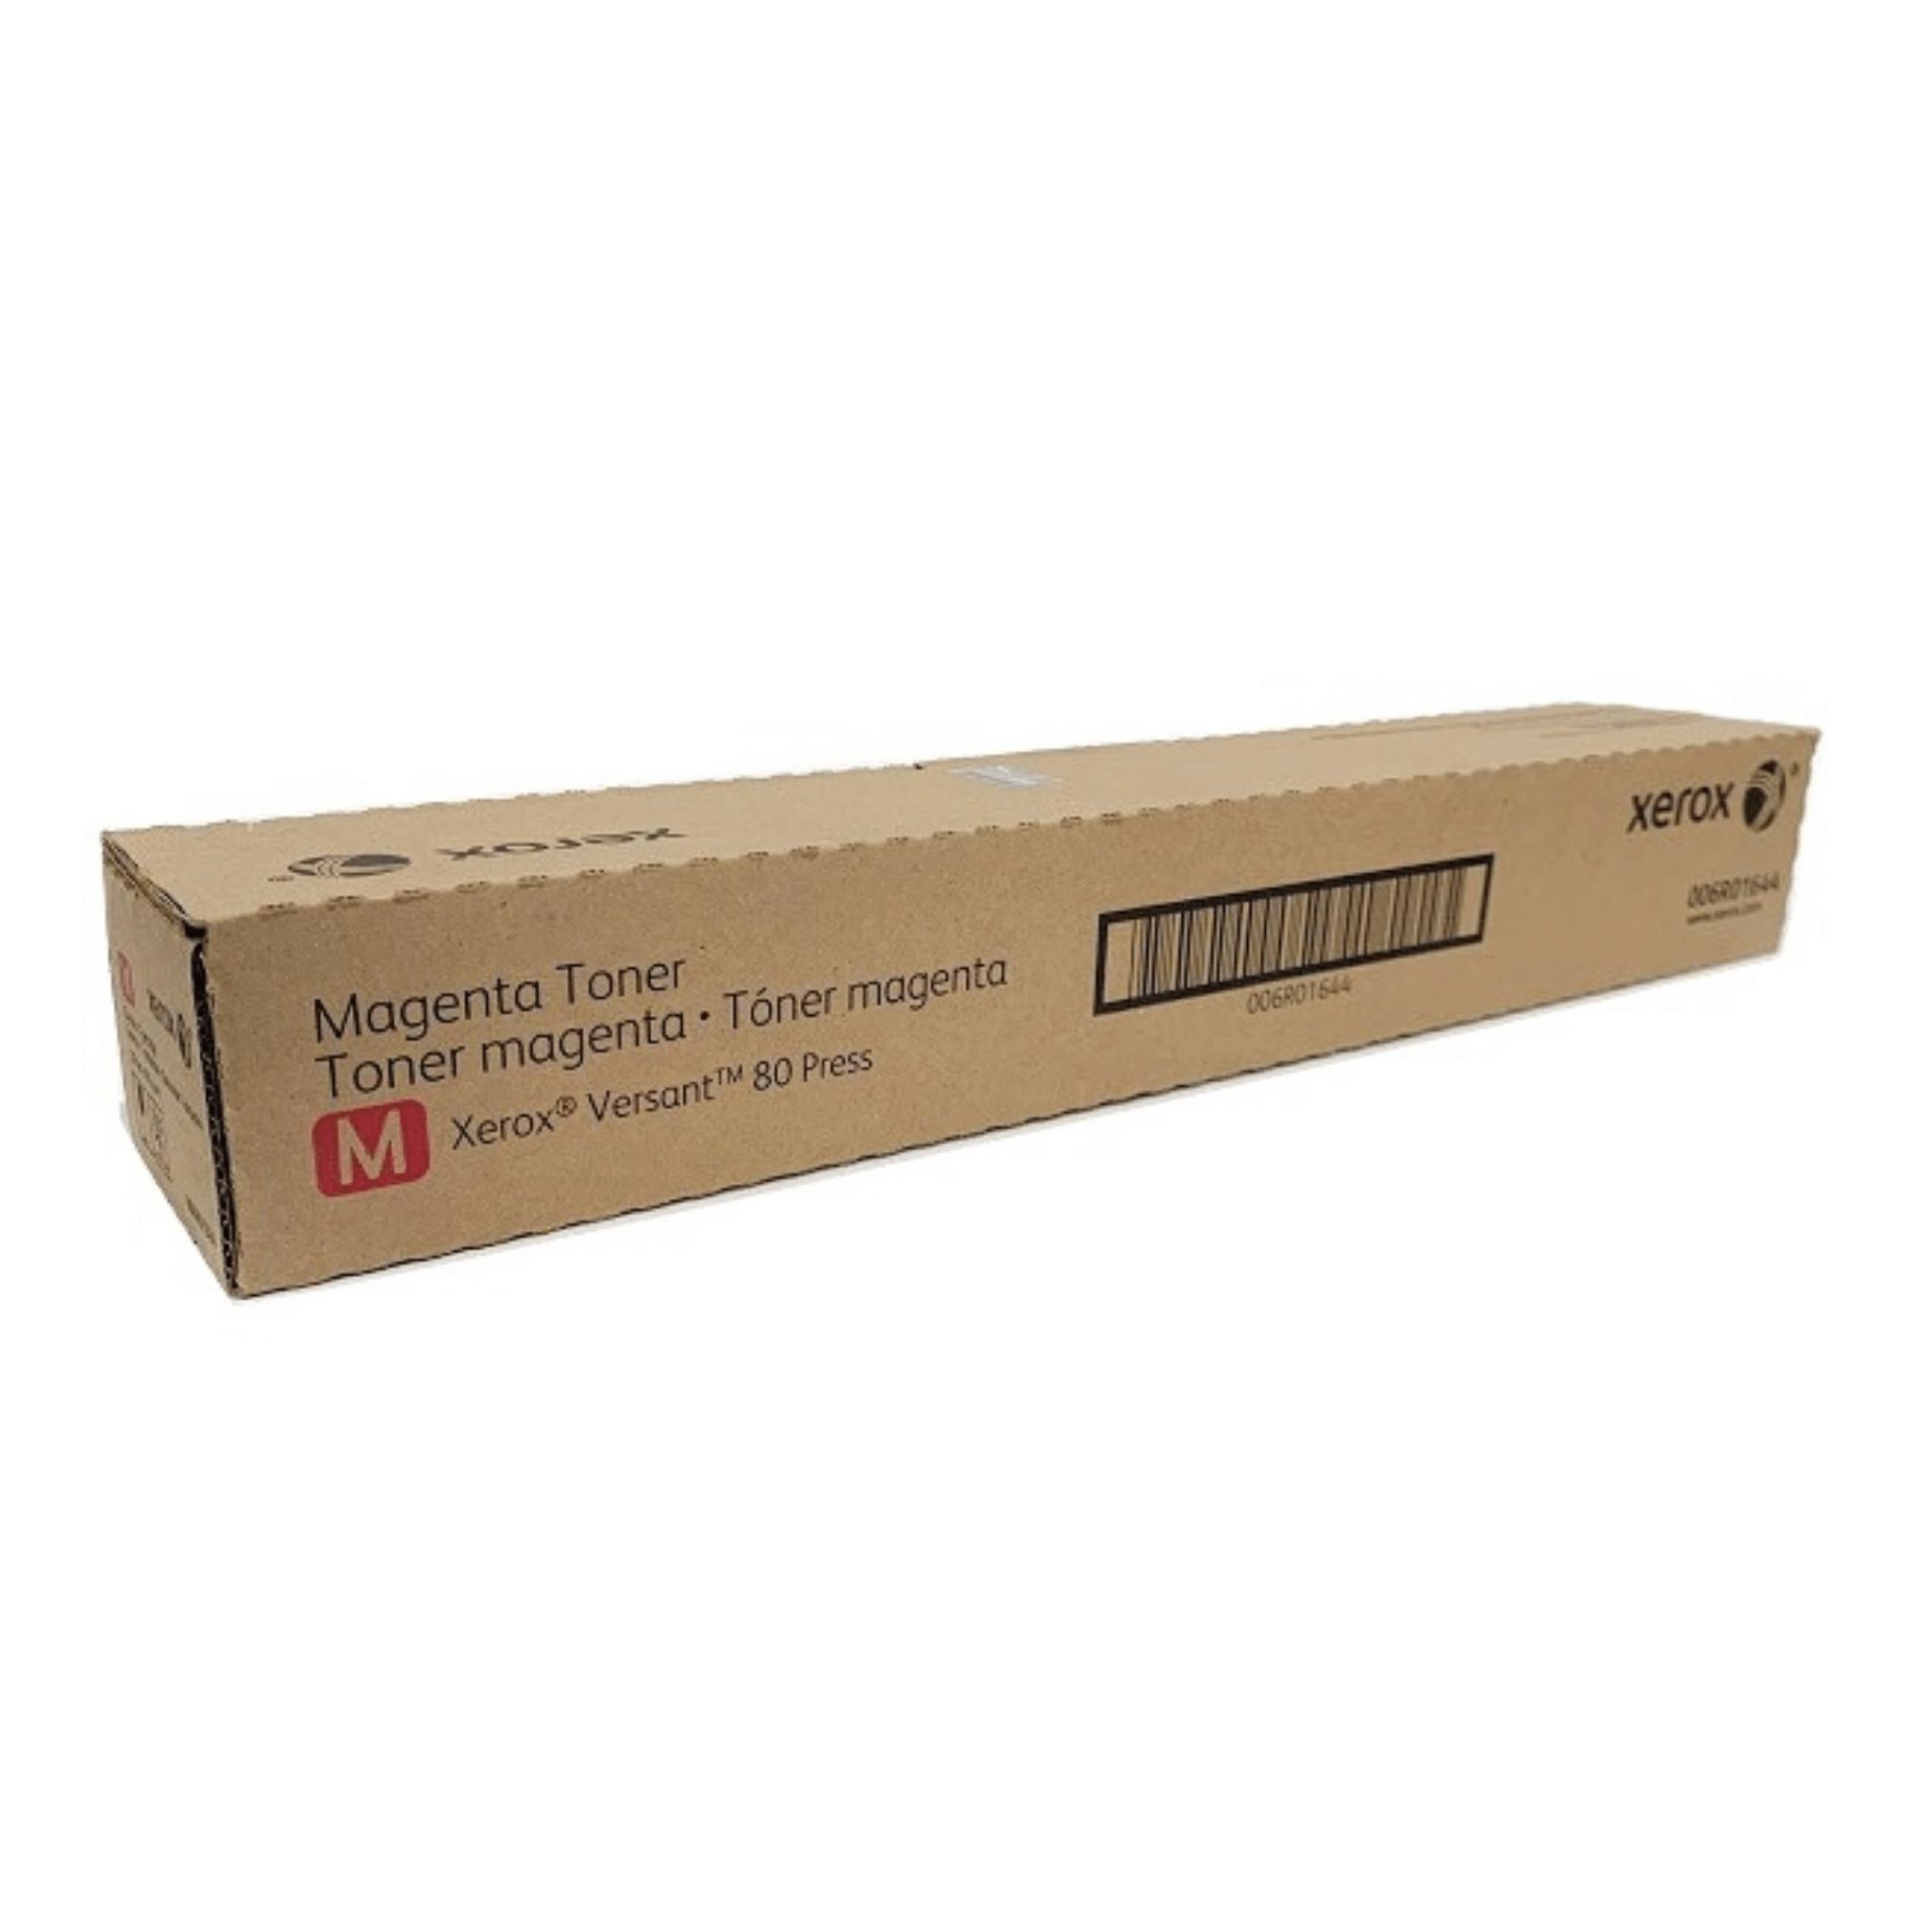 006R01644 - Toner Magenta - Xerox® Versant™ 80/180/280